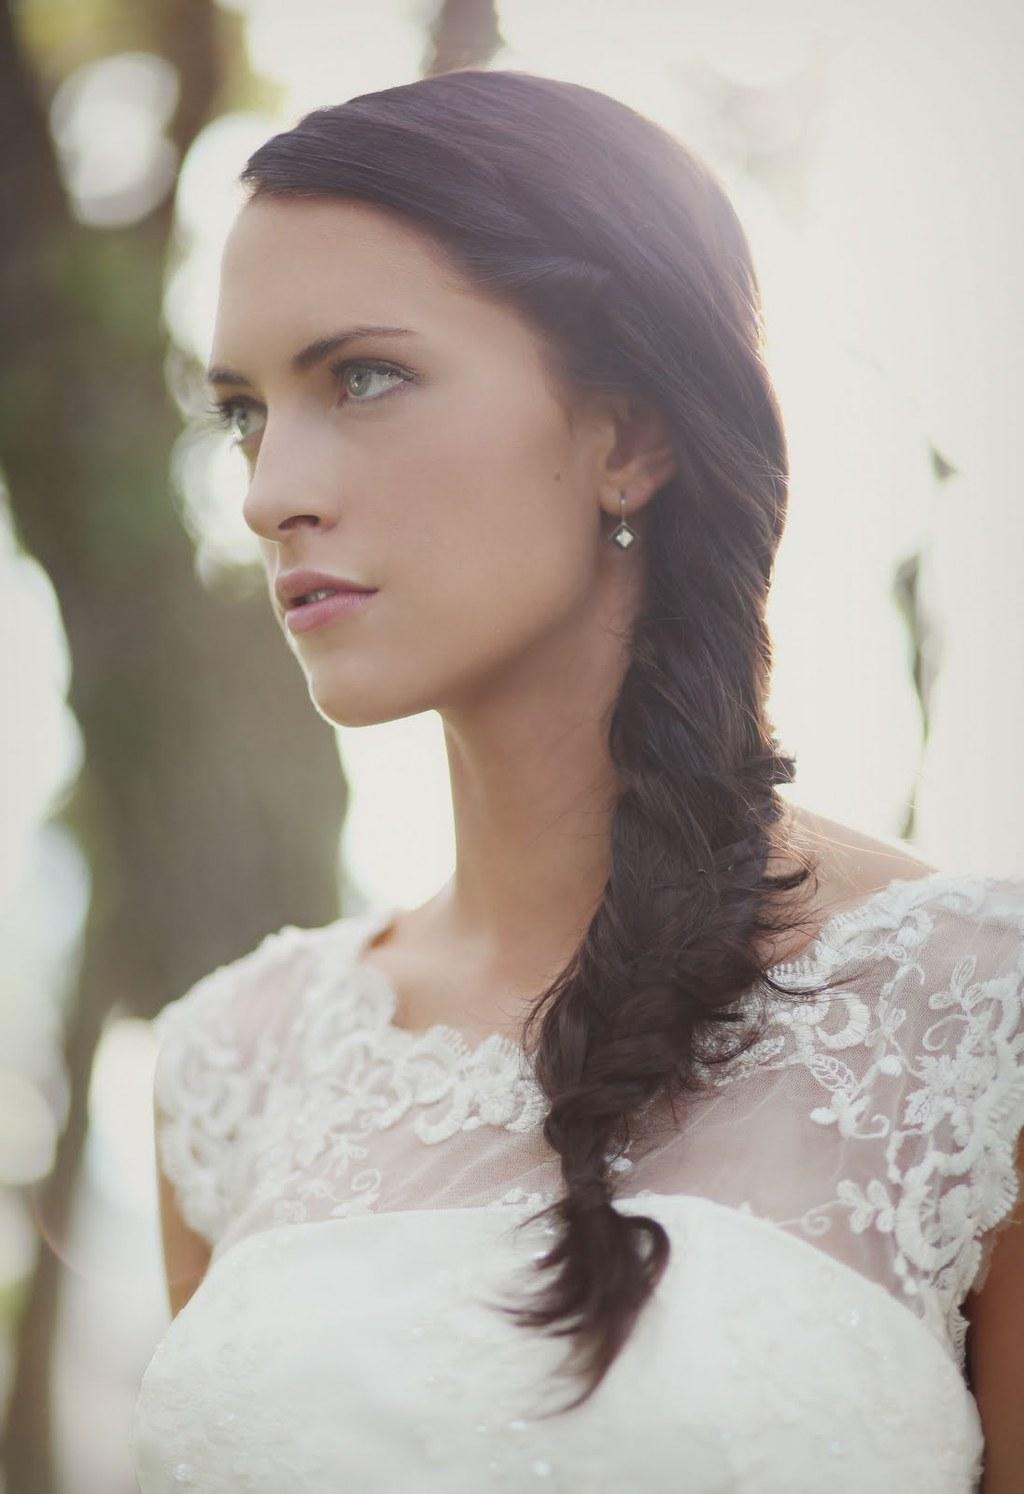 Diy-wedding-hairstyle-loose-updo-braid-lace-wedding-dress.full